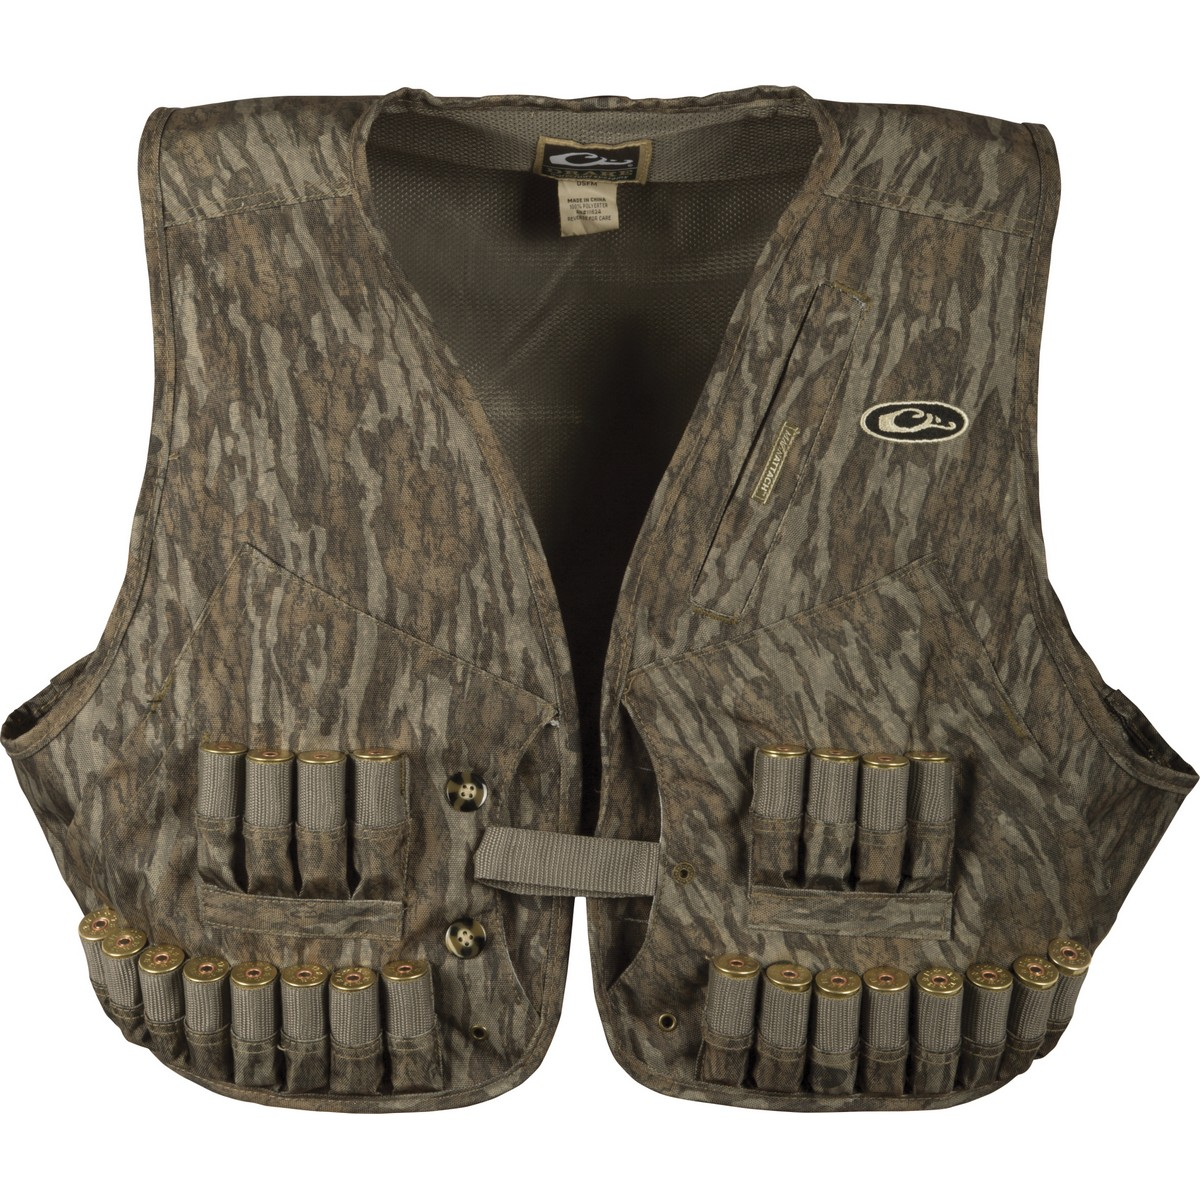 53b2ac860be4b Drake 900D Wading Waterfowl Vest